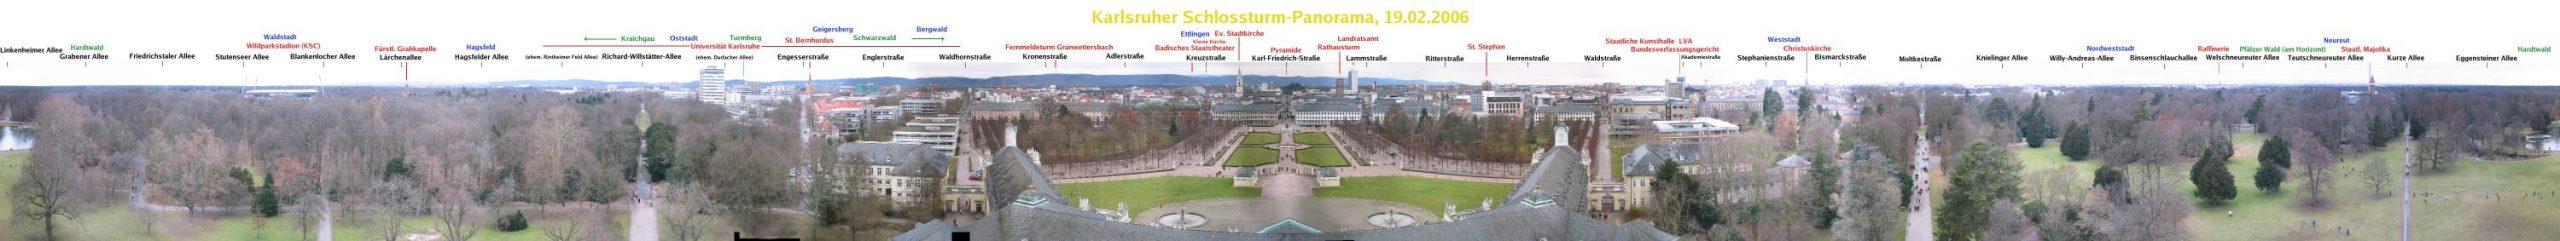 Karlsruhe - Wikiwand dedans Piscine Karlsruhe